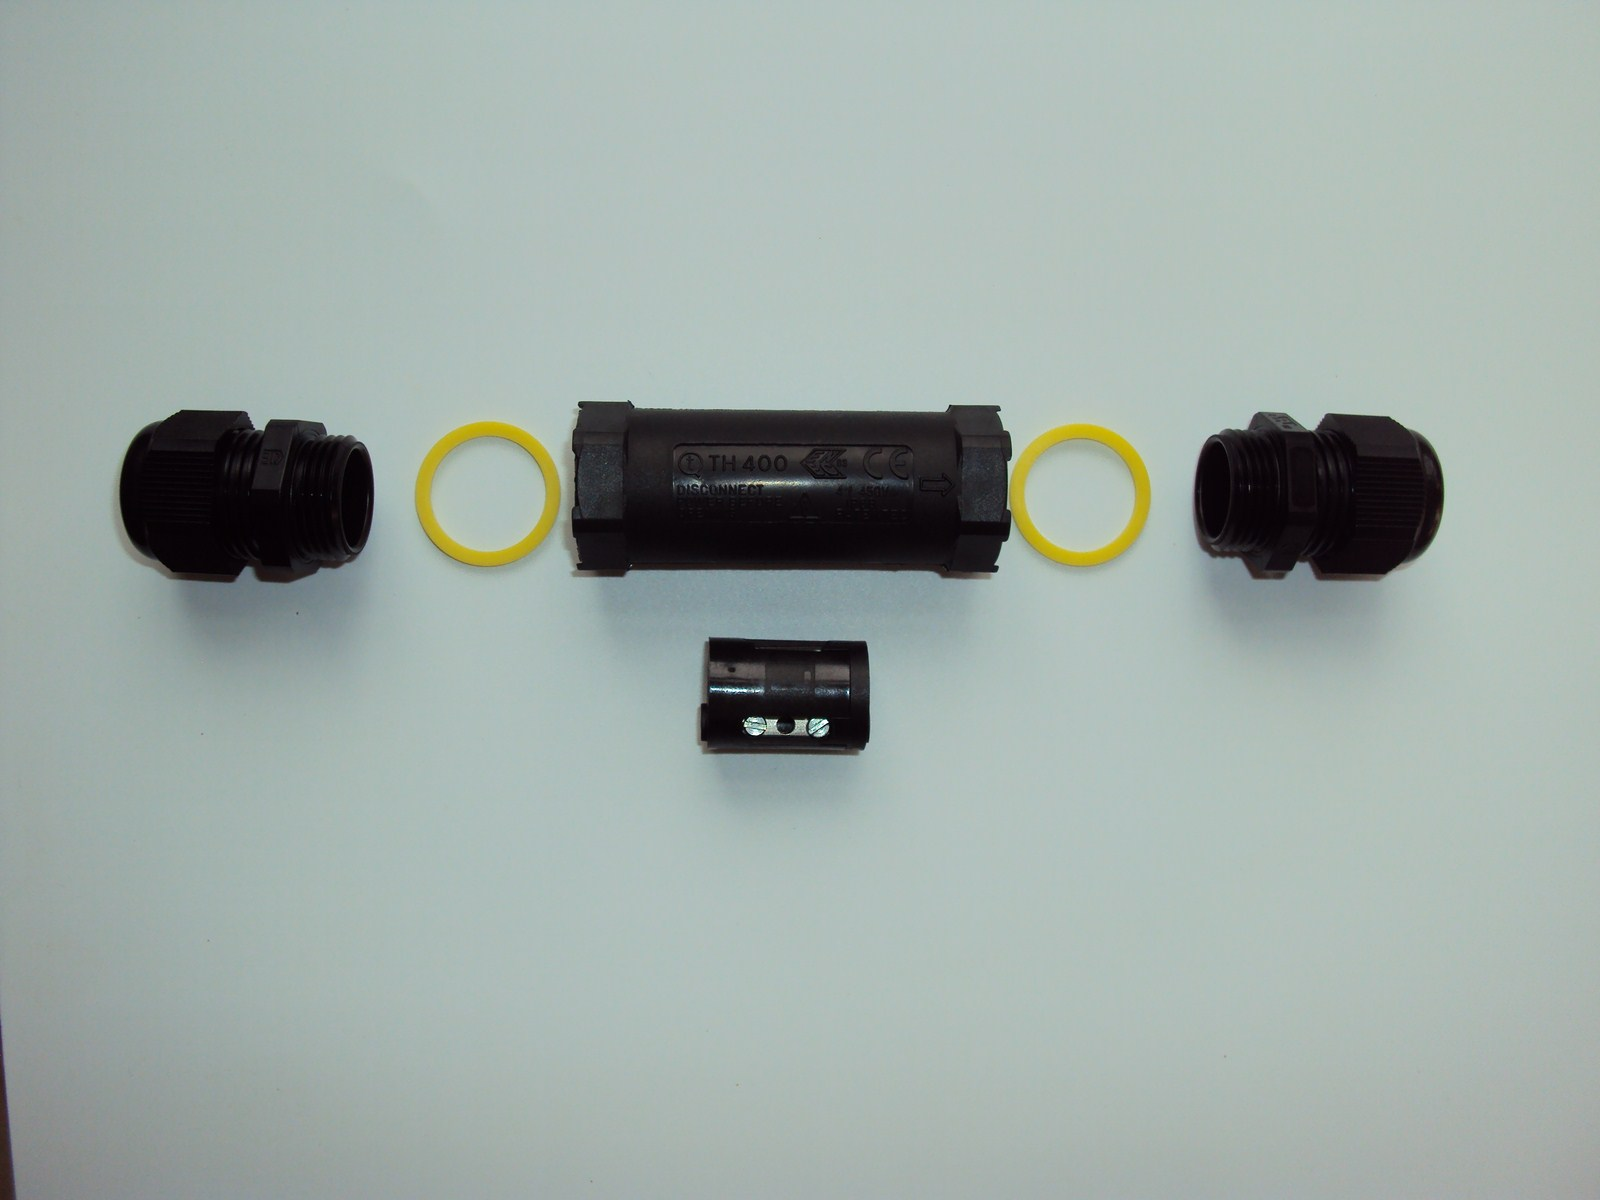 Boite de connexion IP68 (1)